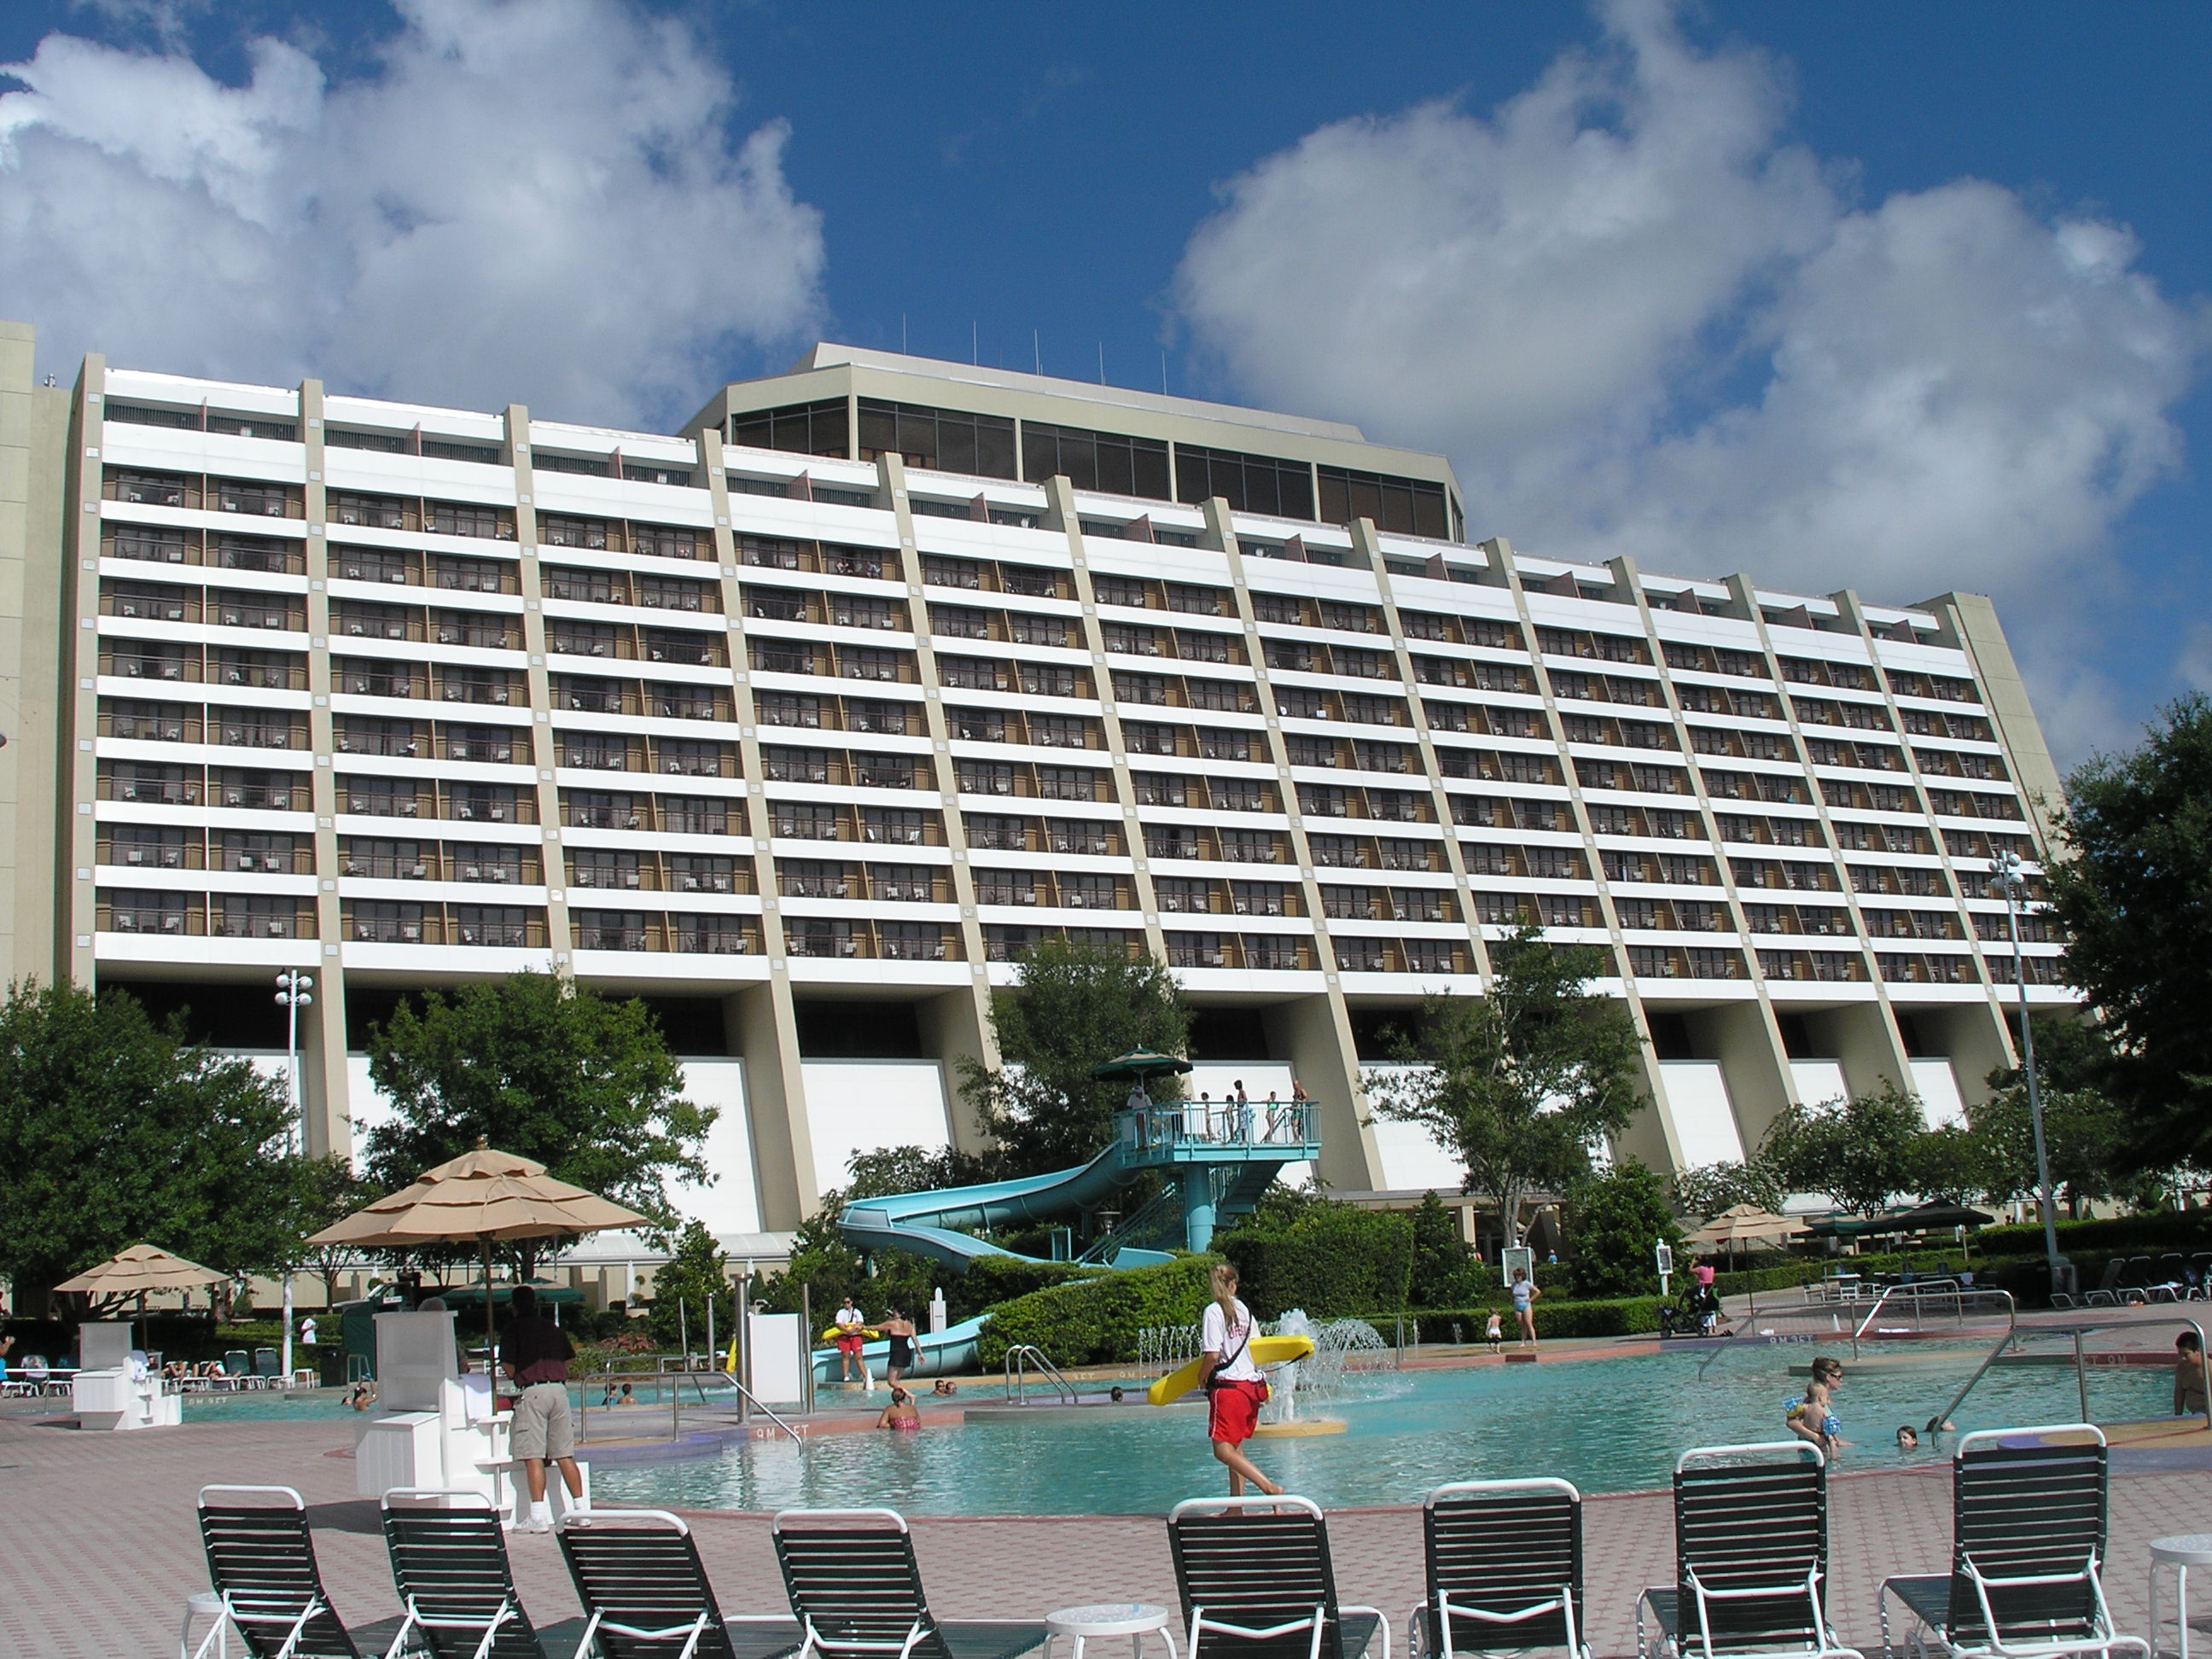 Walt disney world contemporary hotel pool pics4learning for Contemporary hotel pool